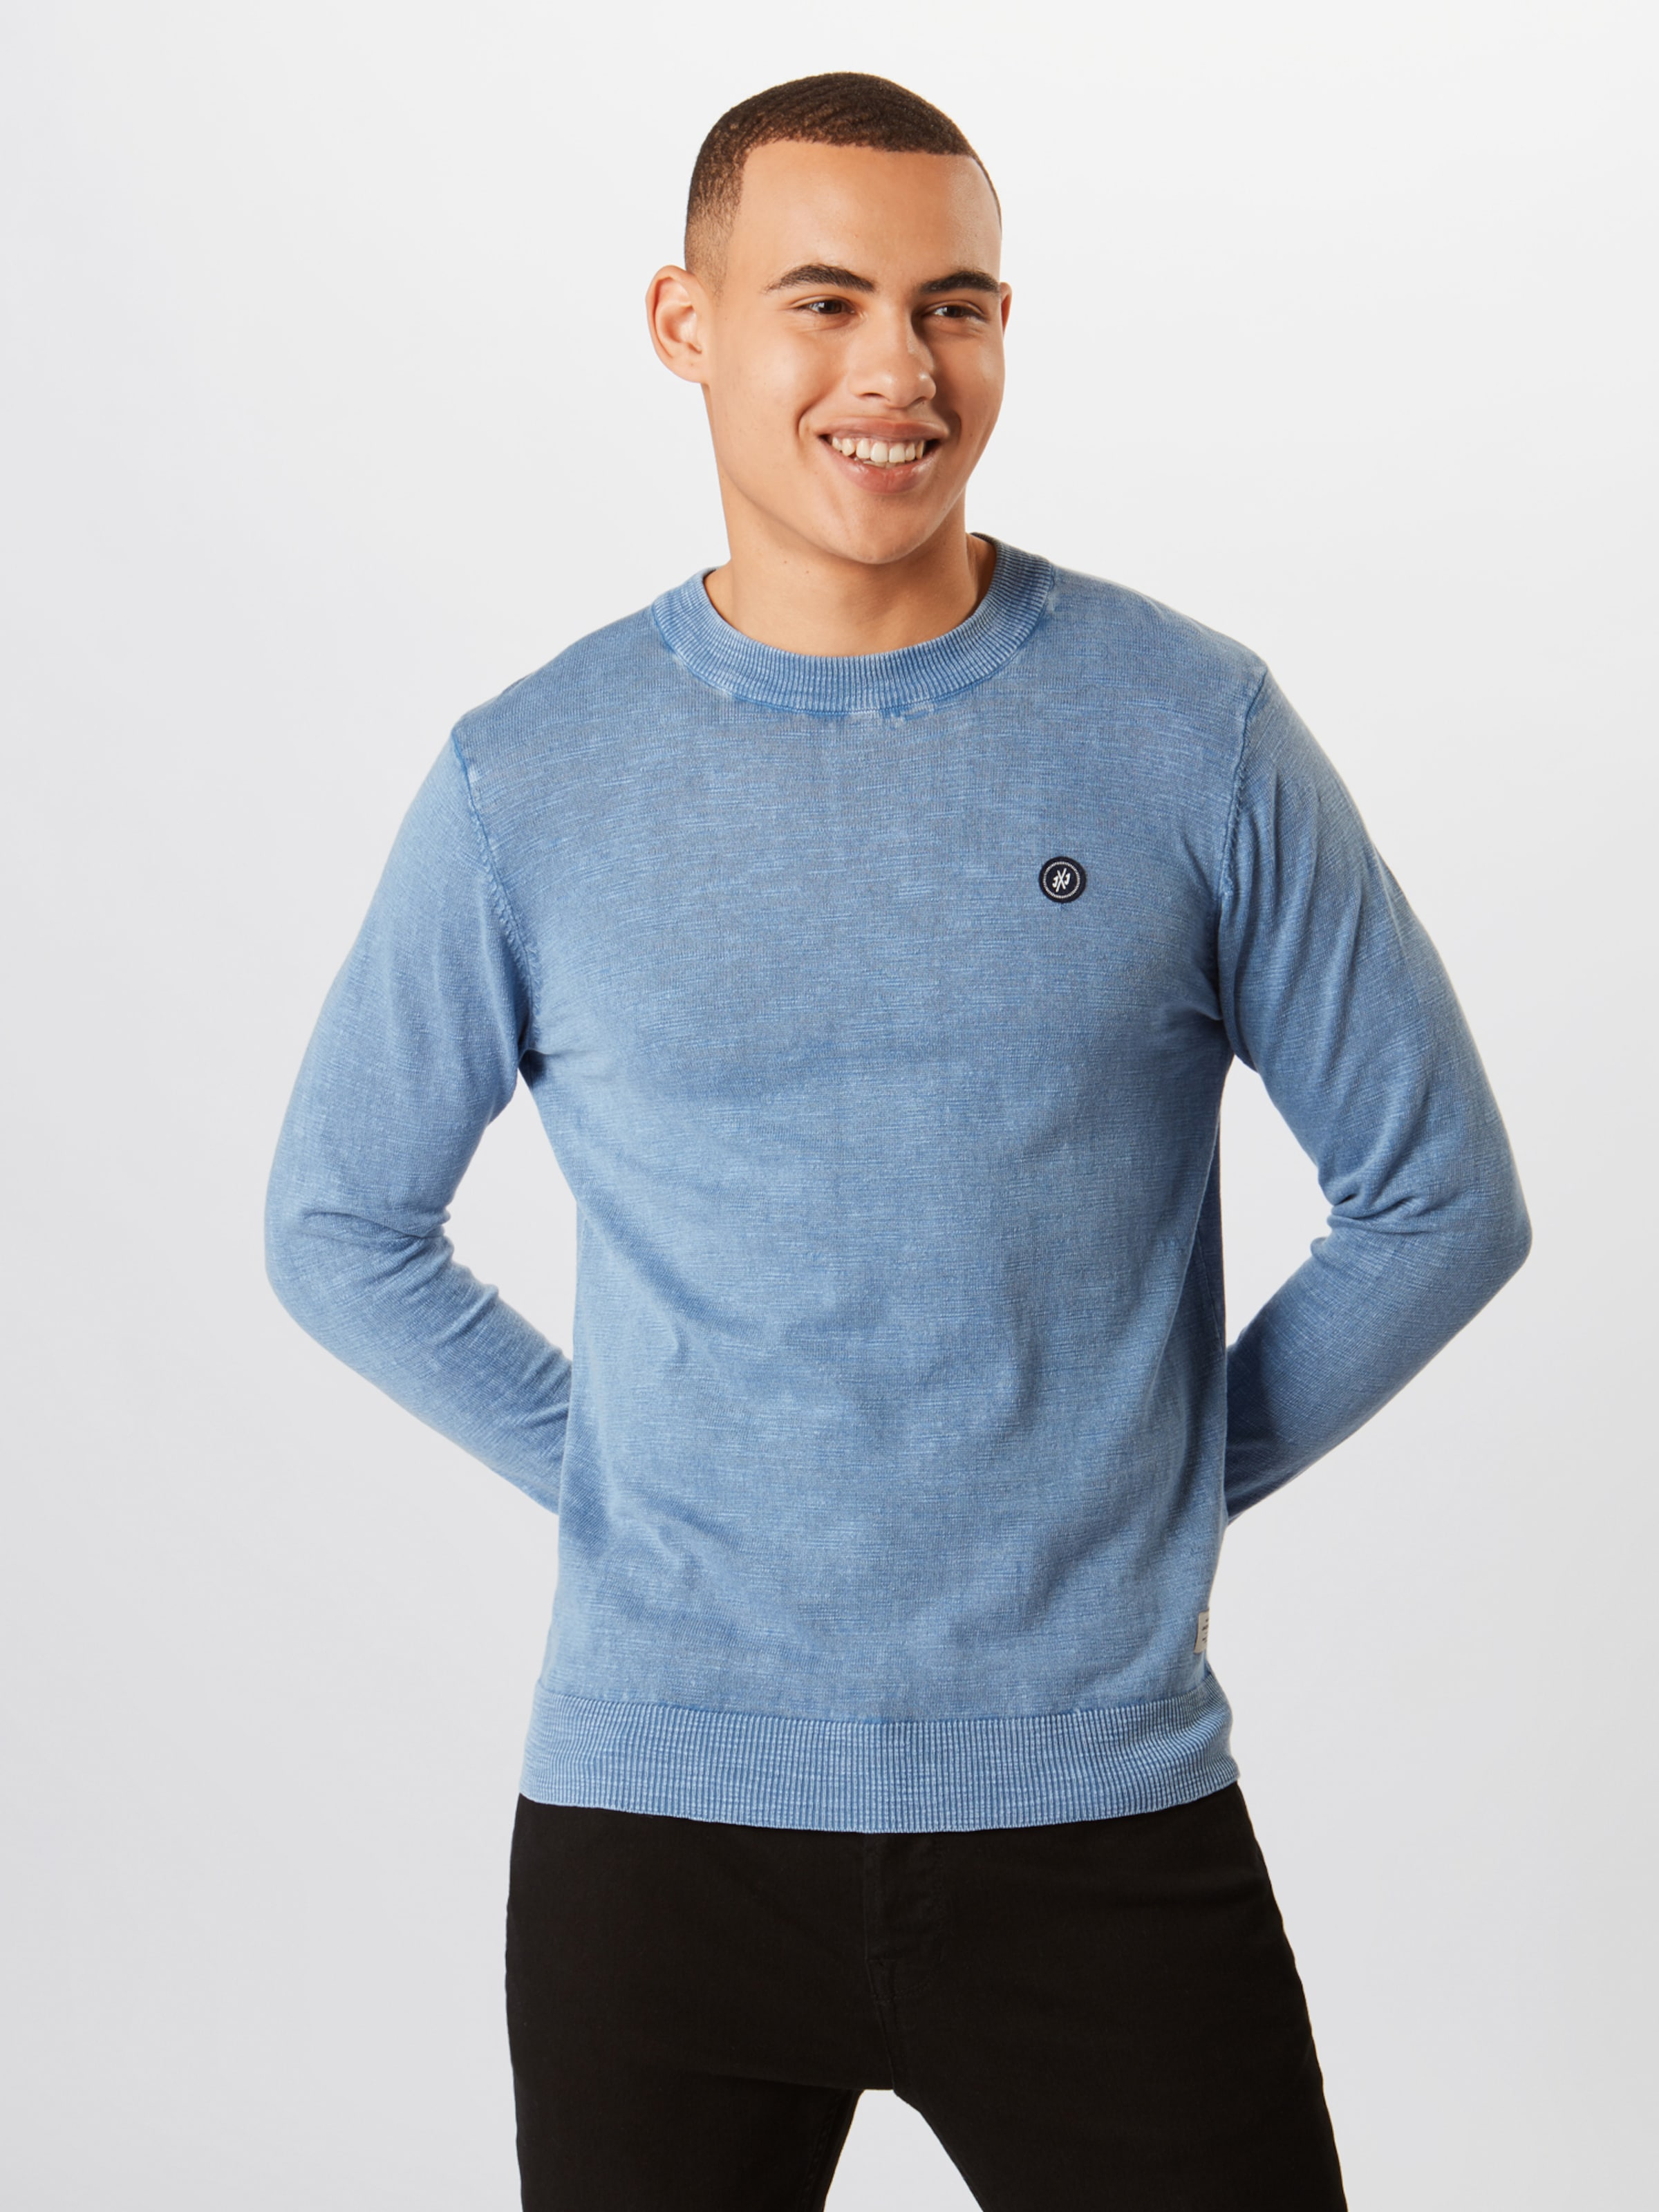 'orsly Jones Neck' Rauchblau Crew Pullover Knit Jackamp; In droBCxe